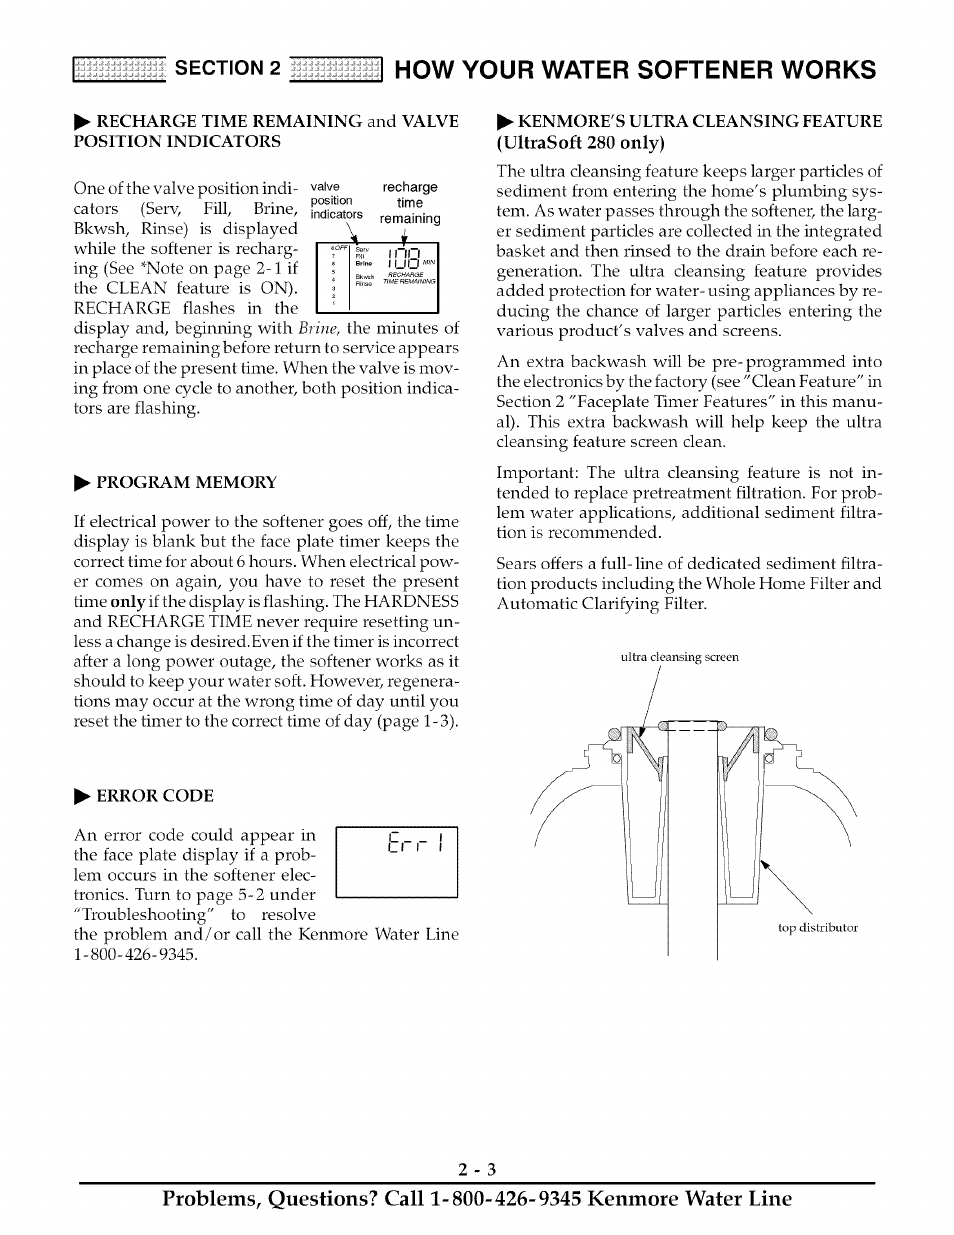 Program Memory Error Code How Your Water Softener Works Kenmore Ultrasoft 280 User